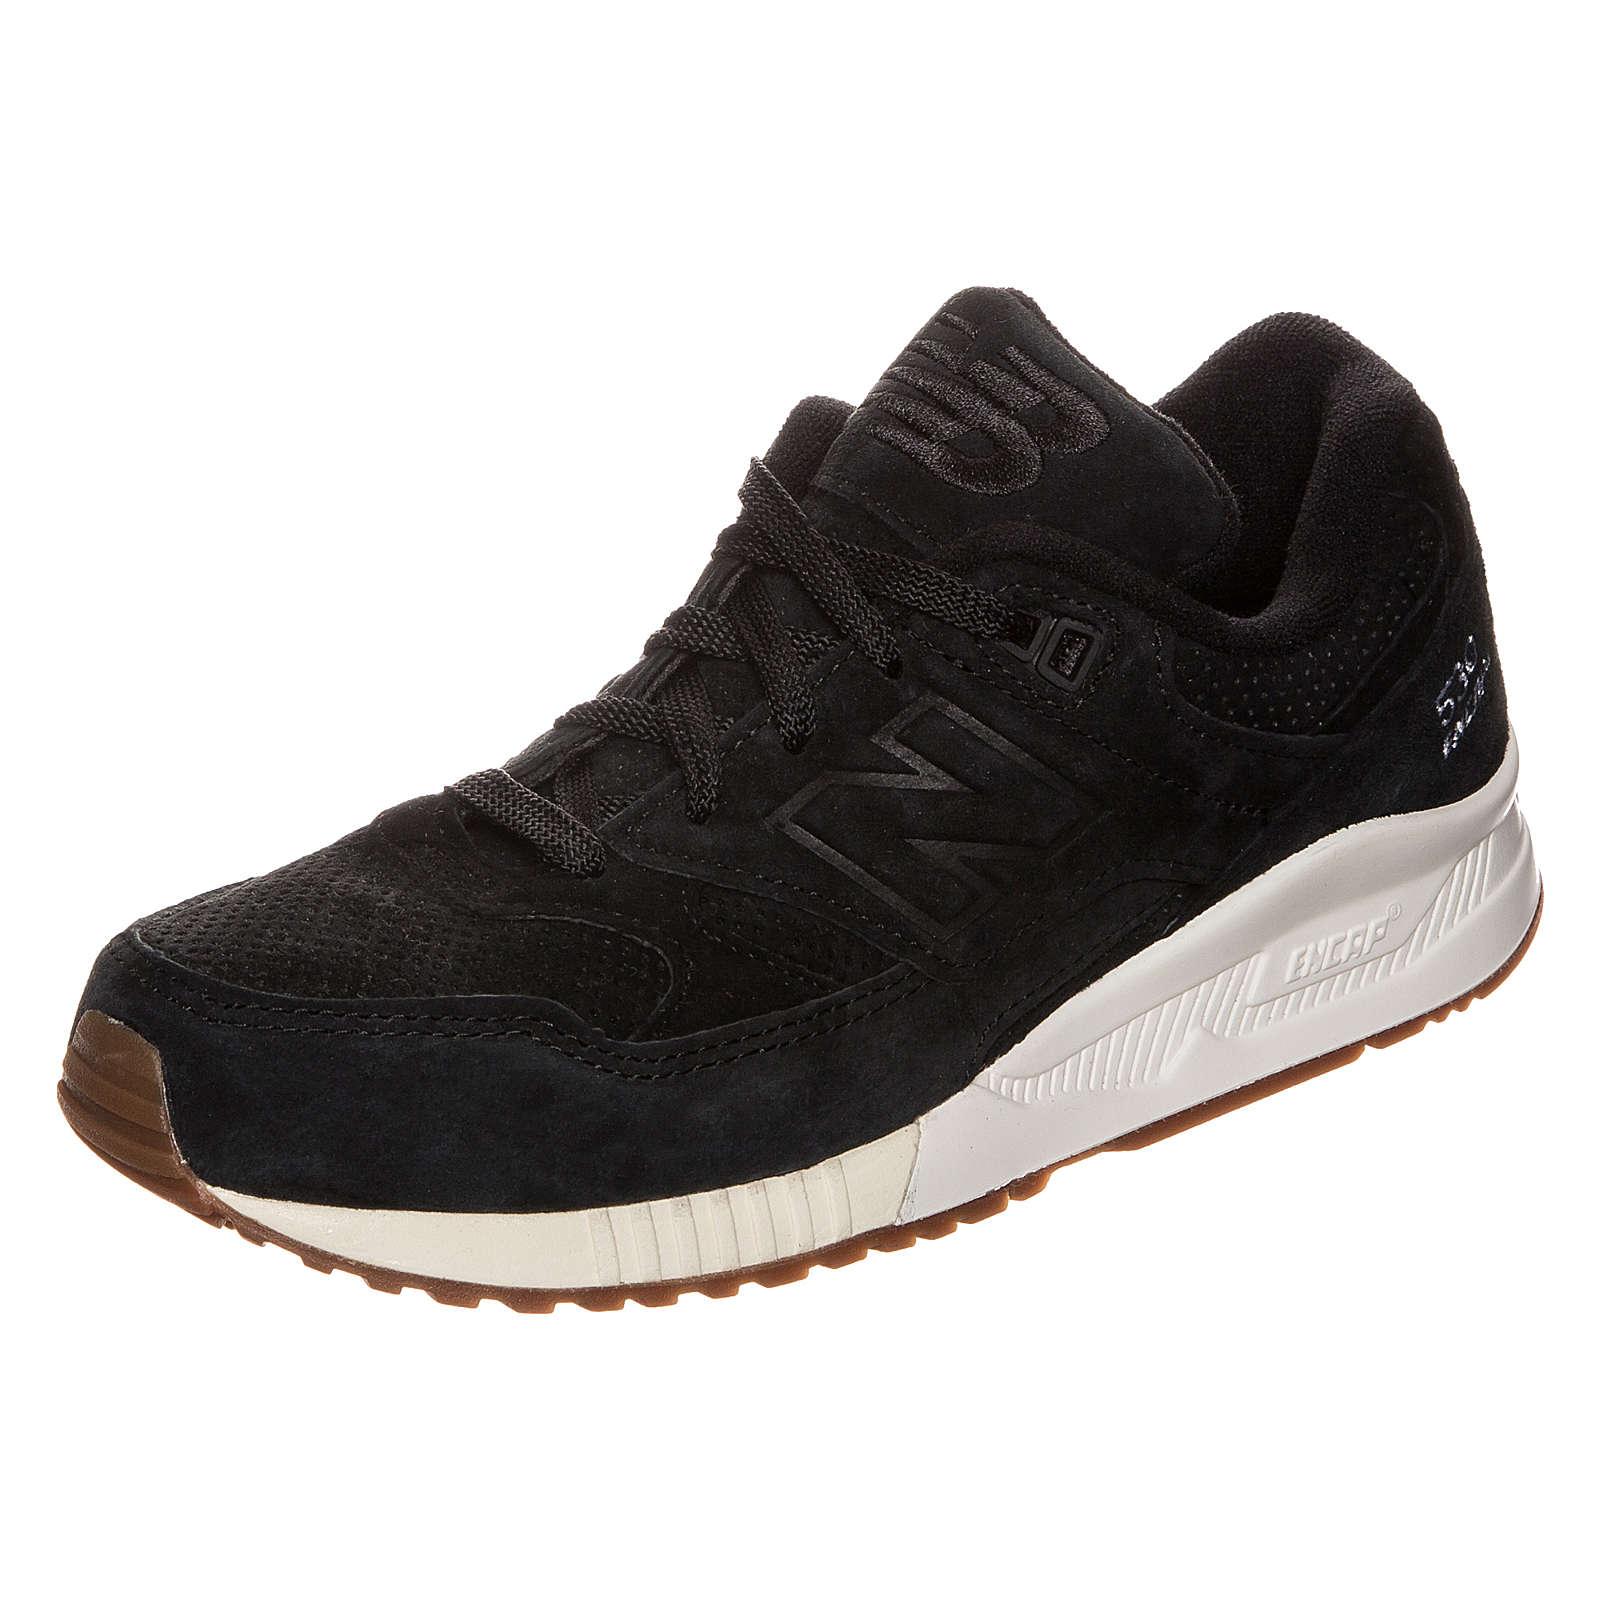 New Balance W530-PRA-B Sneaker Damen schwarz Damen Gr. 37